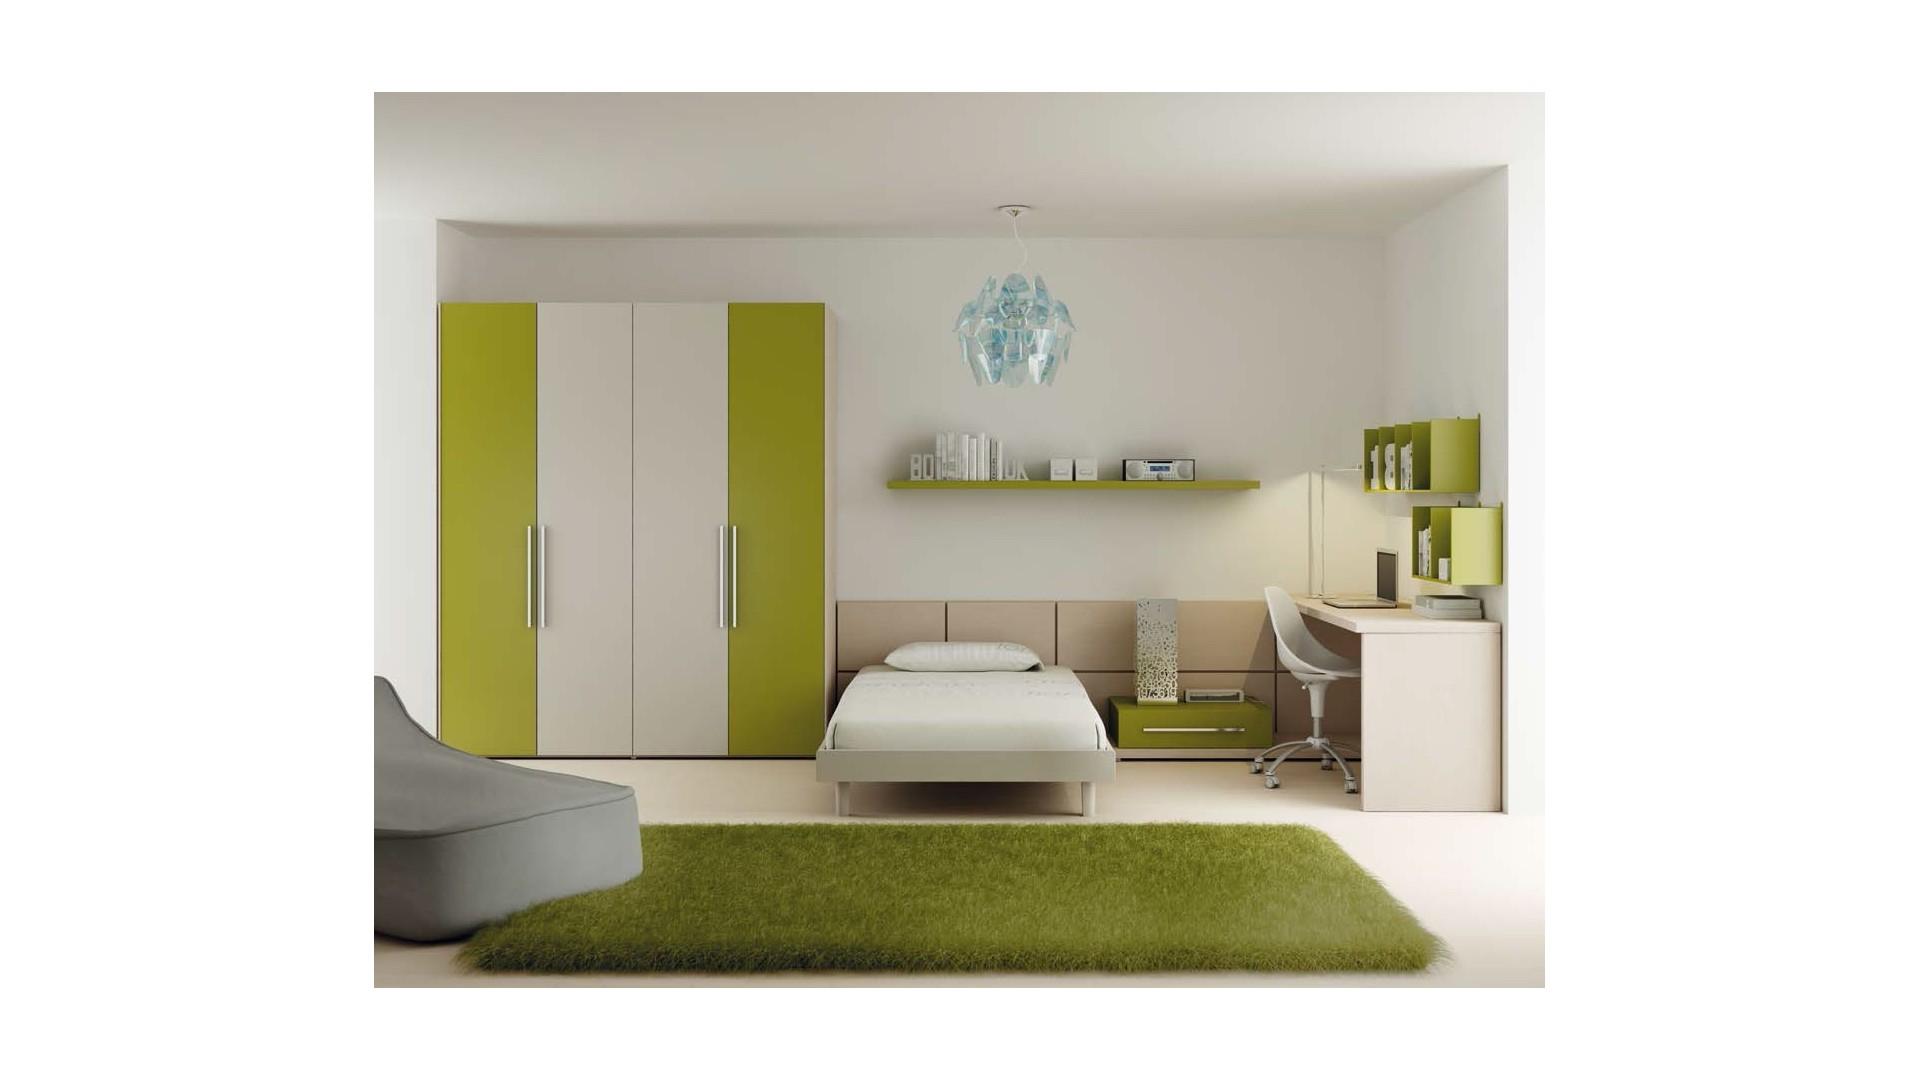 chambre compl te avec lit ado pur moretti compact so nuit. Black Bedroom Furniture Sets. Home Design Ideas